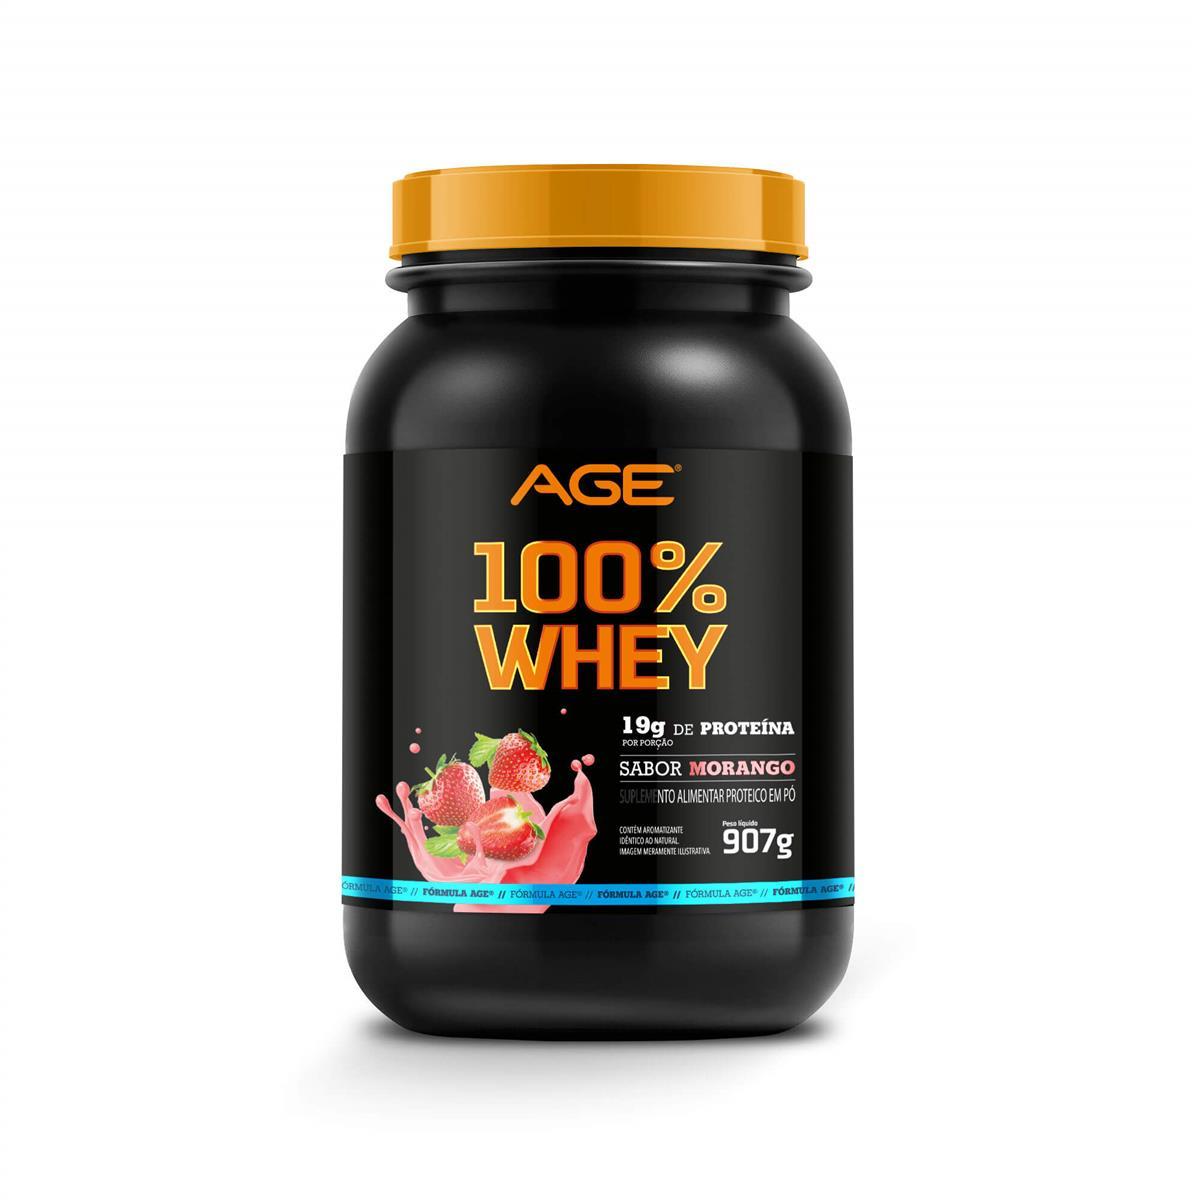 WHEY 100% PURE (907g) - Morango - AGE